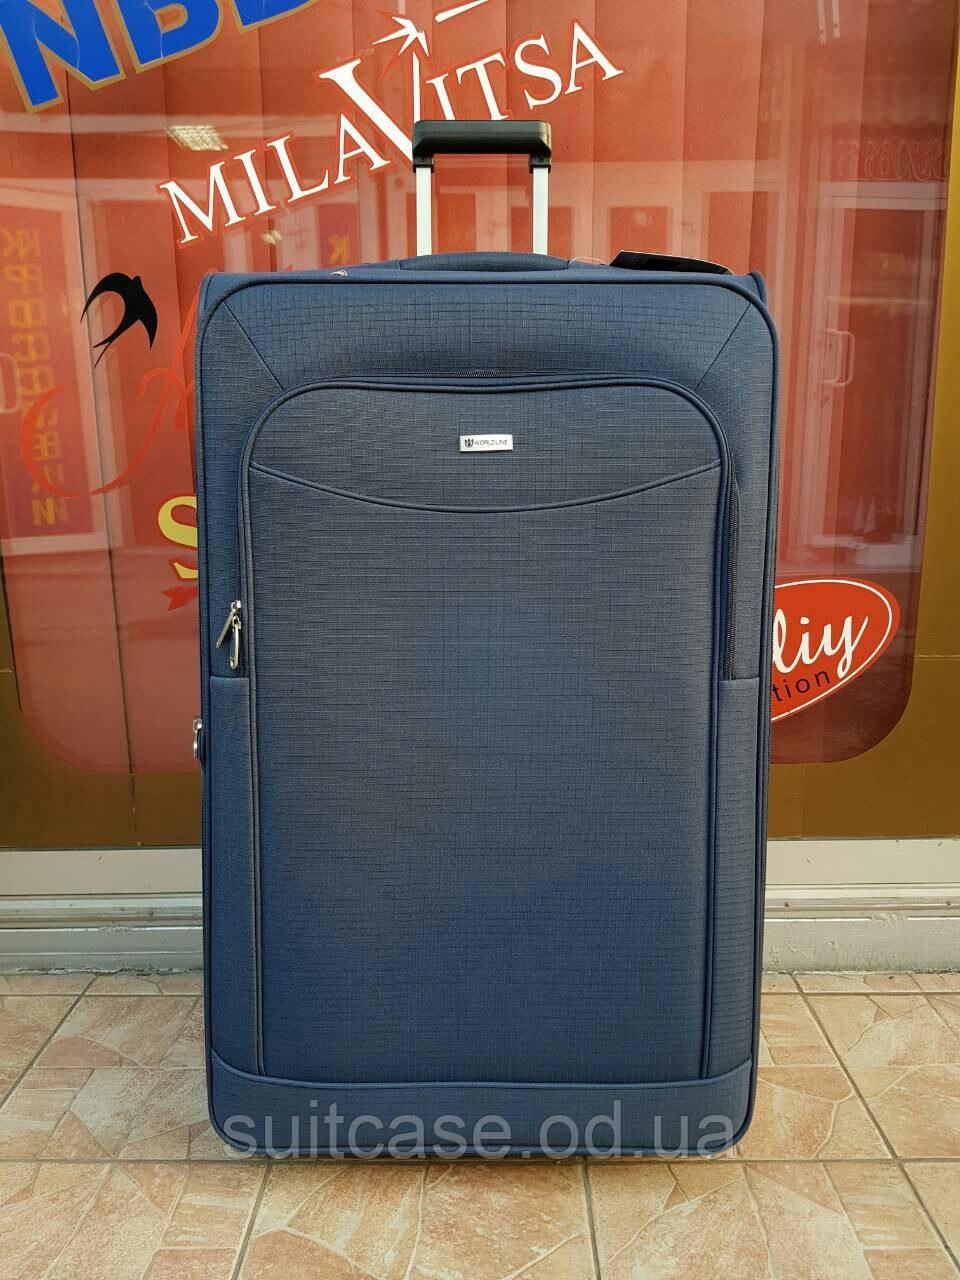 УДОБНЫЙ легкий чемодан AIRTEX 522 4 гигант WORLDLINE ,Одесса -  Интернет-магазин